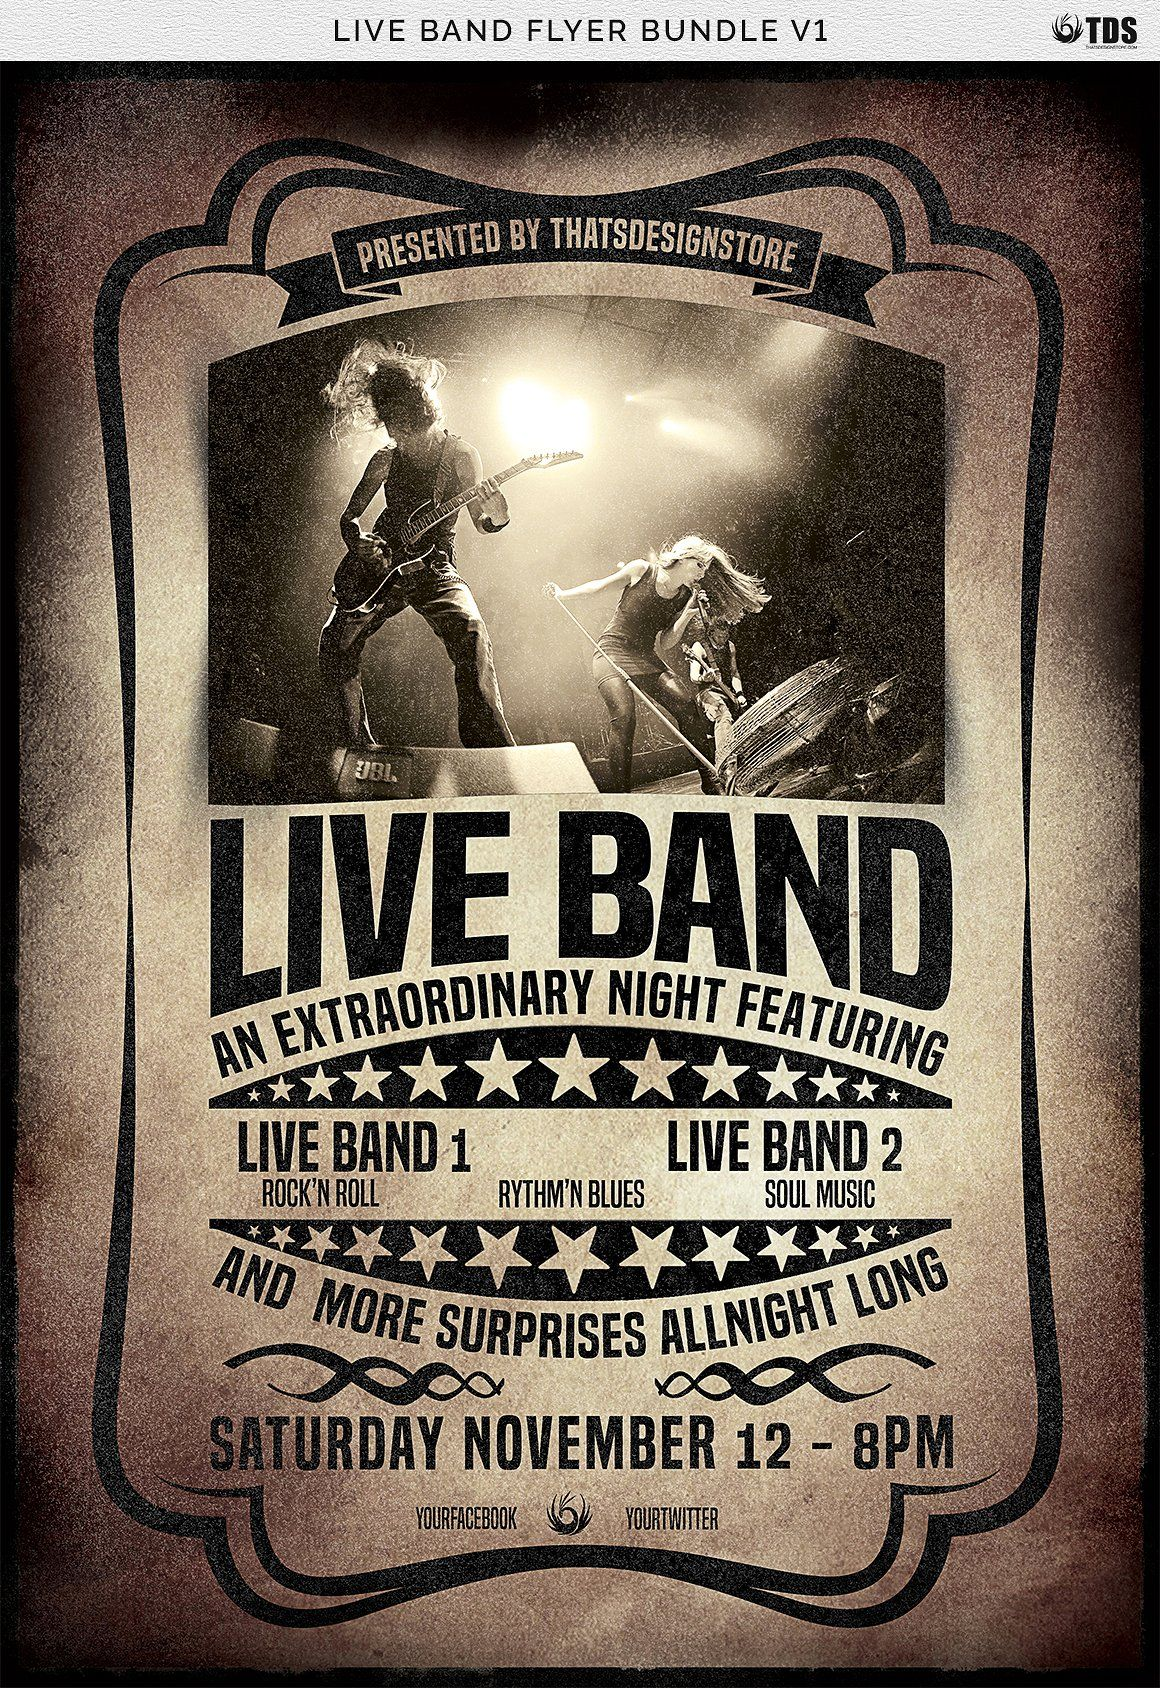 Live band flyer bundle v1 codedcolorlabeledeasy